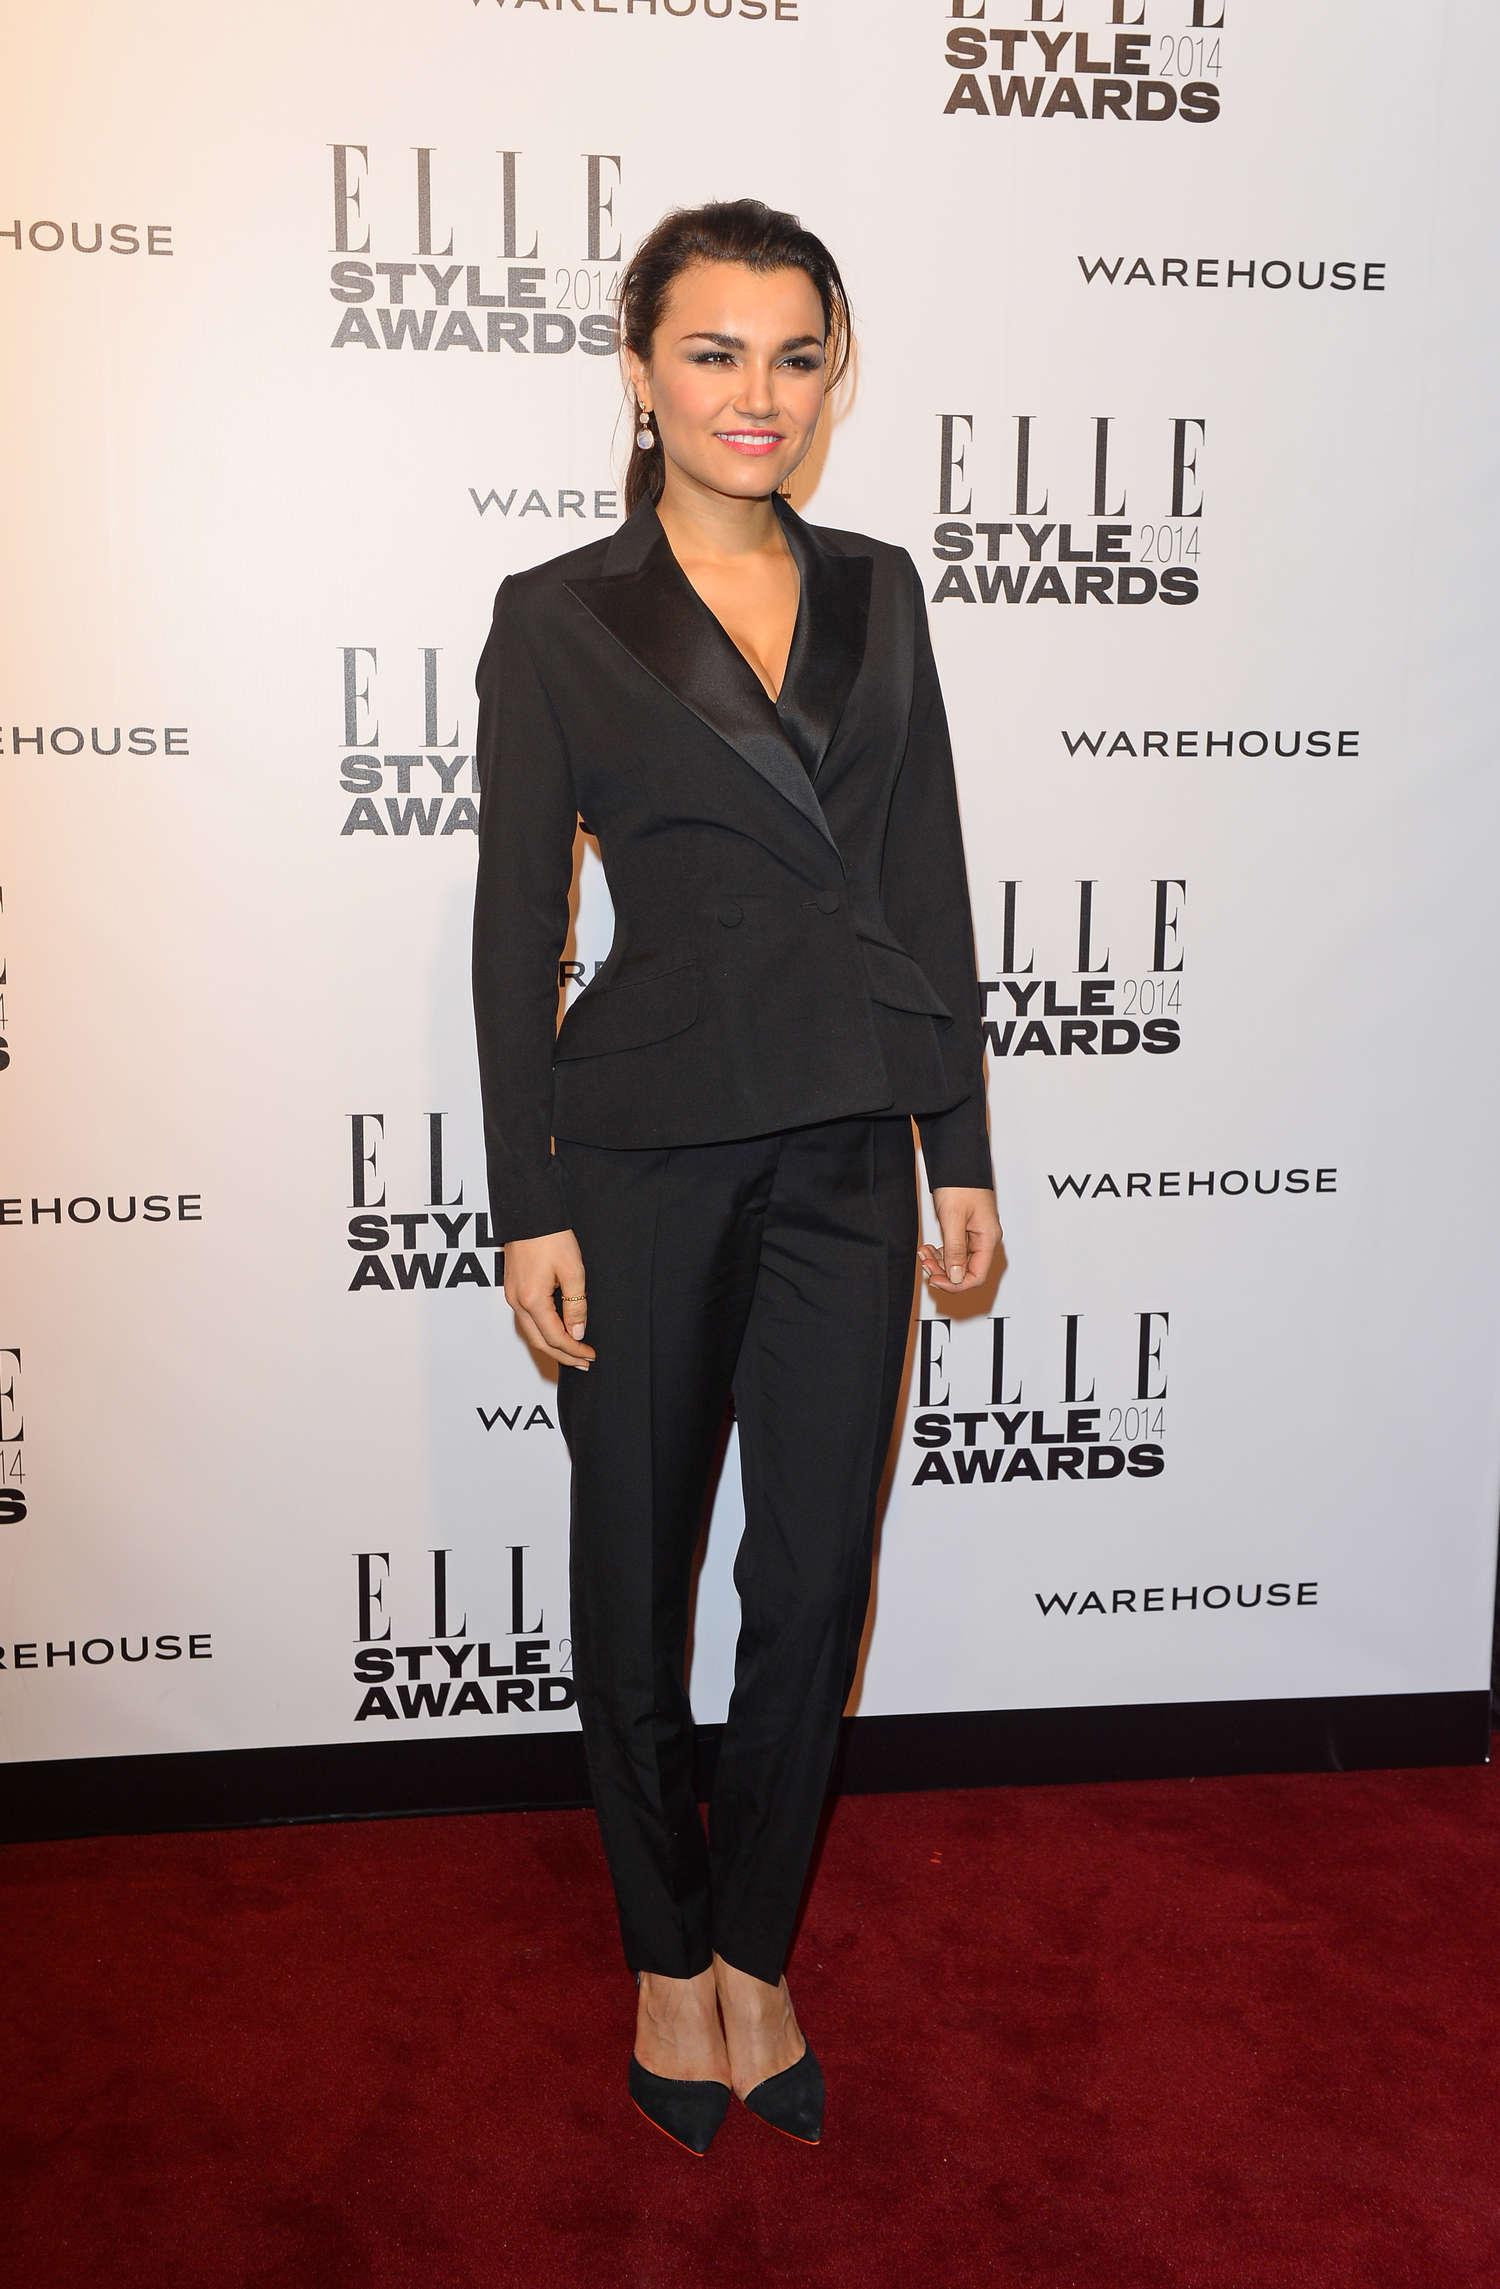 Samantha Barks Elle Style Awards in London